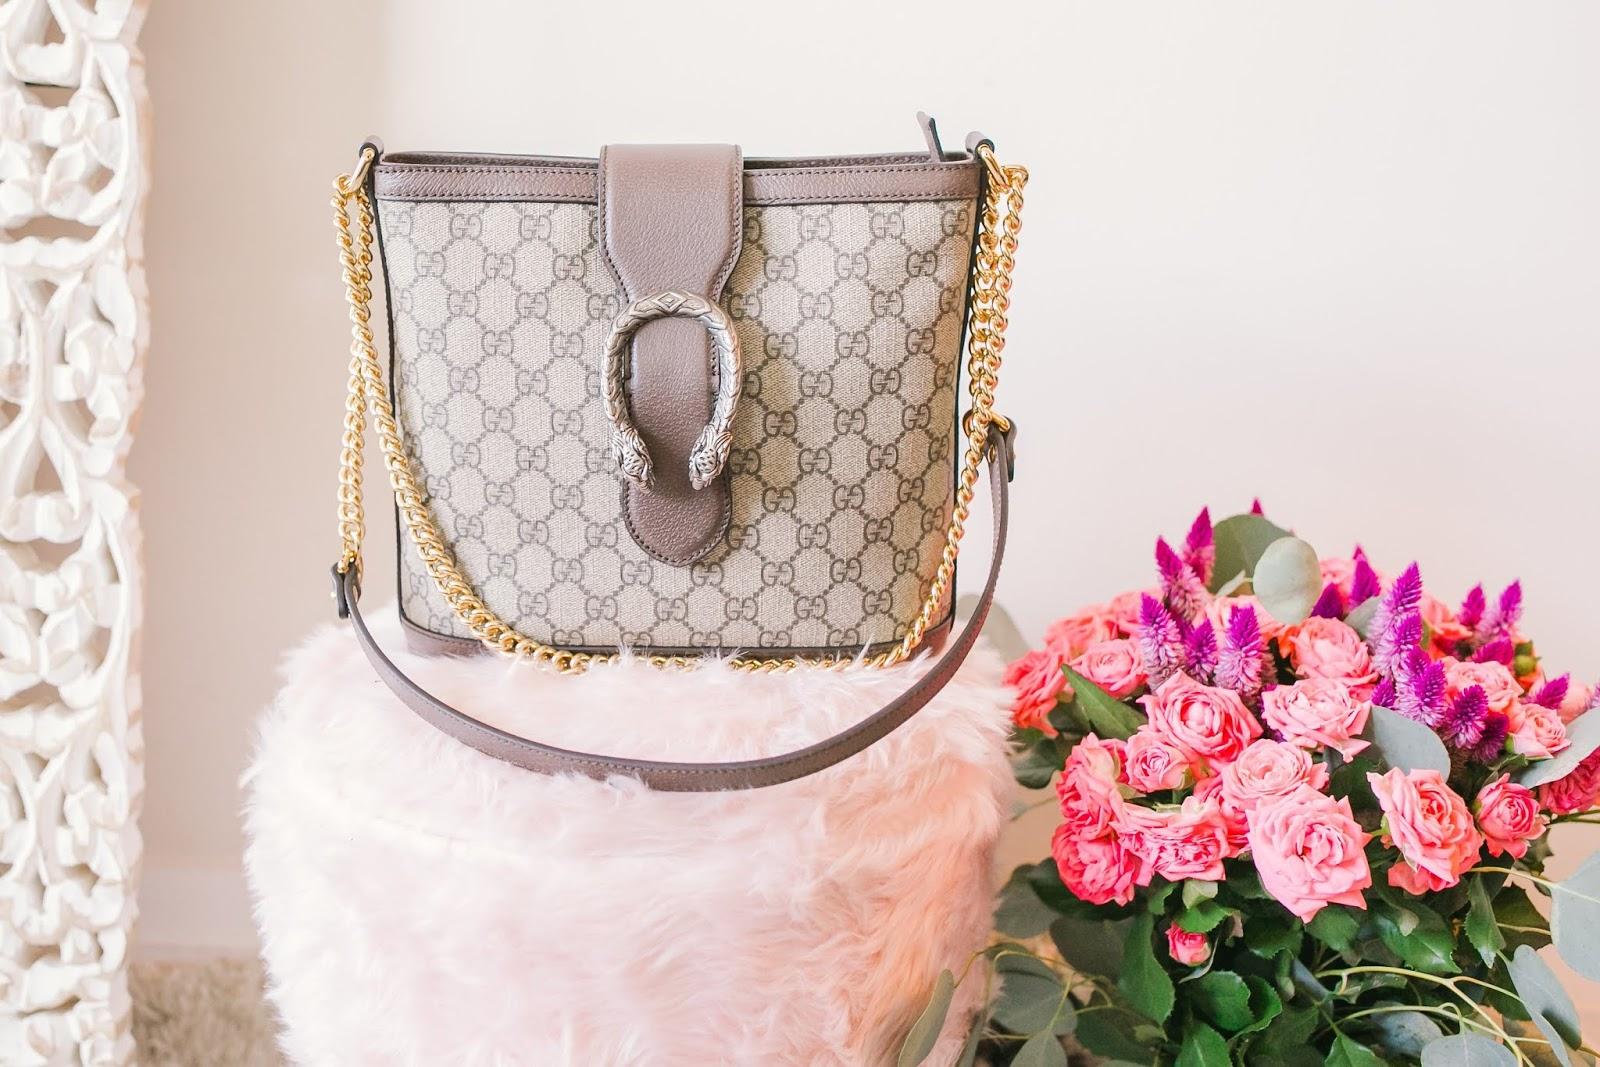 Bijuleni - Dionysus Medium GG Bucket Bag Review